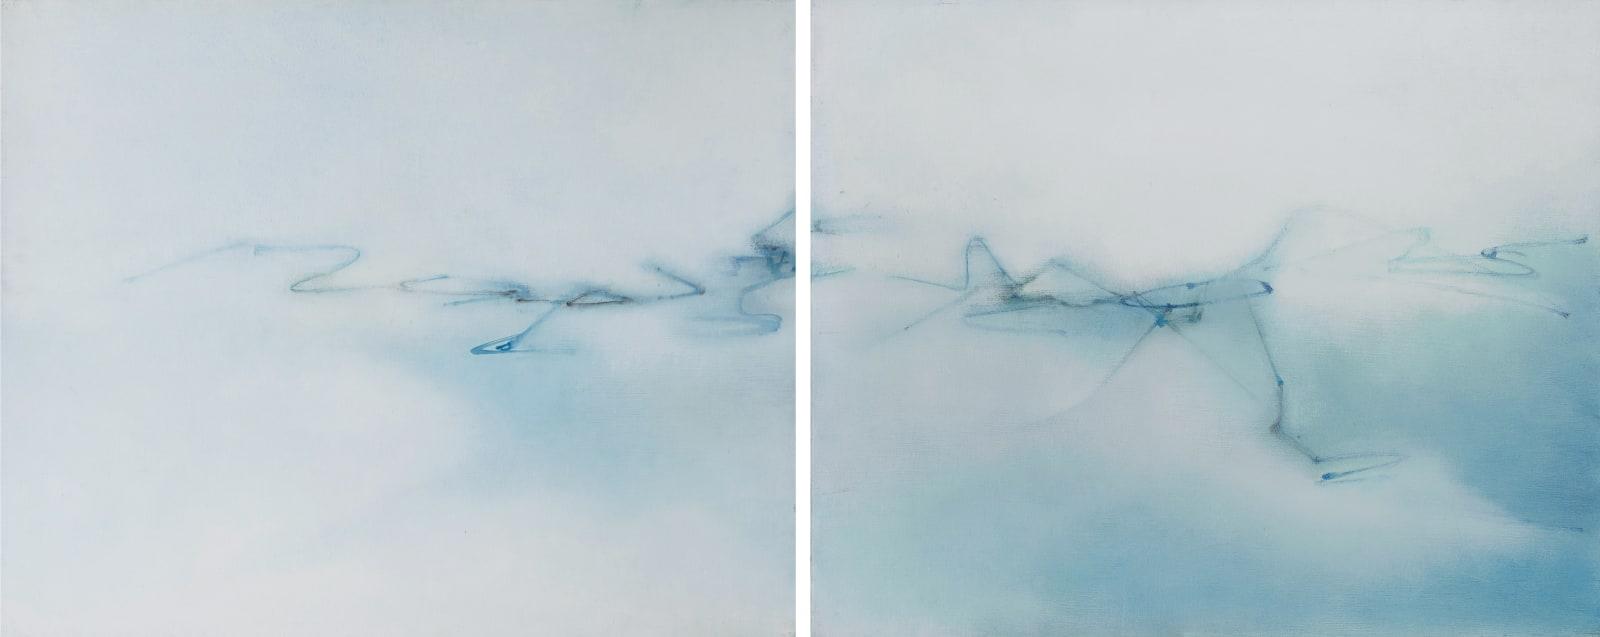 Lalan 謝景蘭, Le slience I & II | The Silence I & II 《靜默 (一) 及 (二)》, 1970s